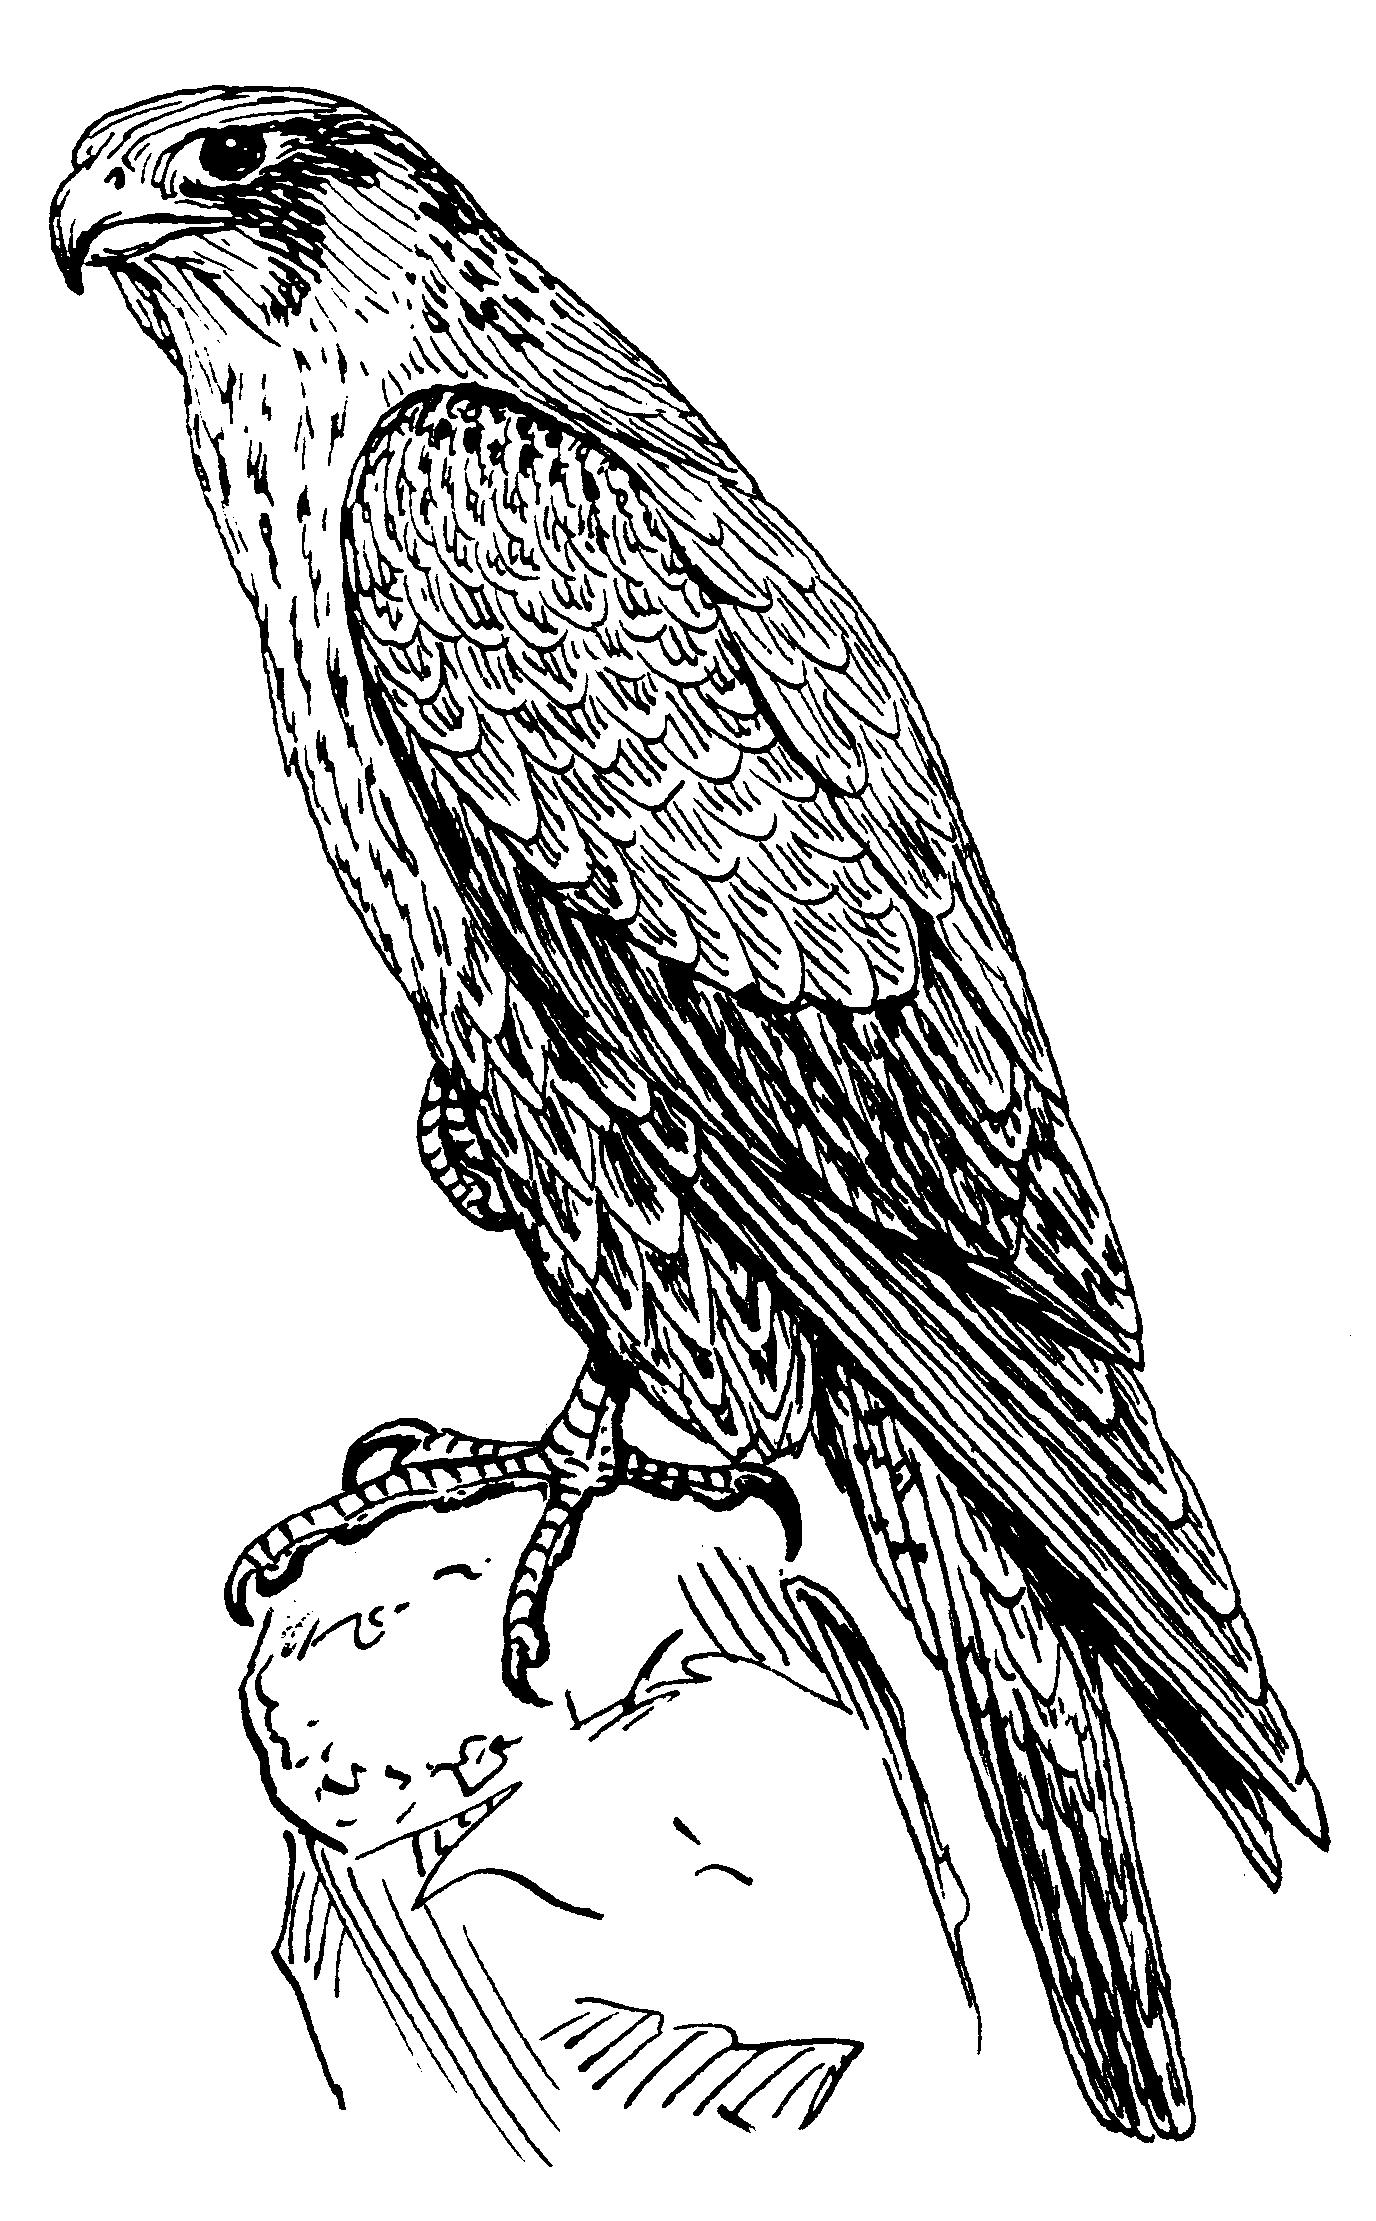 FilePeregrine Falcon PSFpng Wikimedia Commons